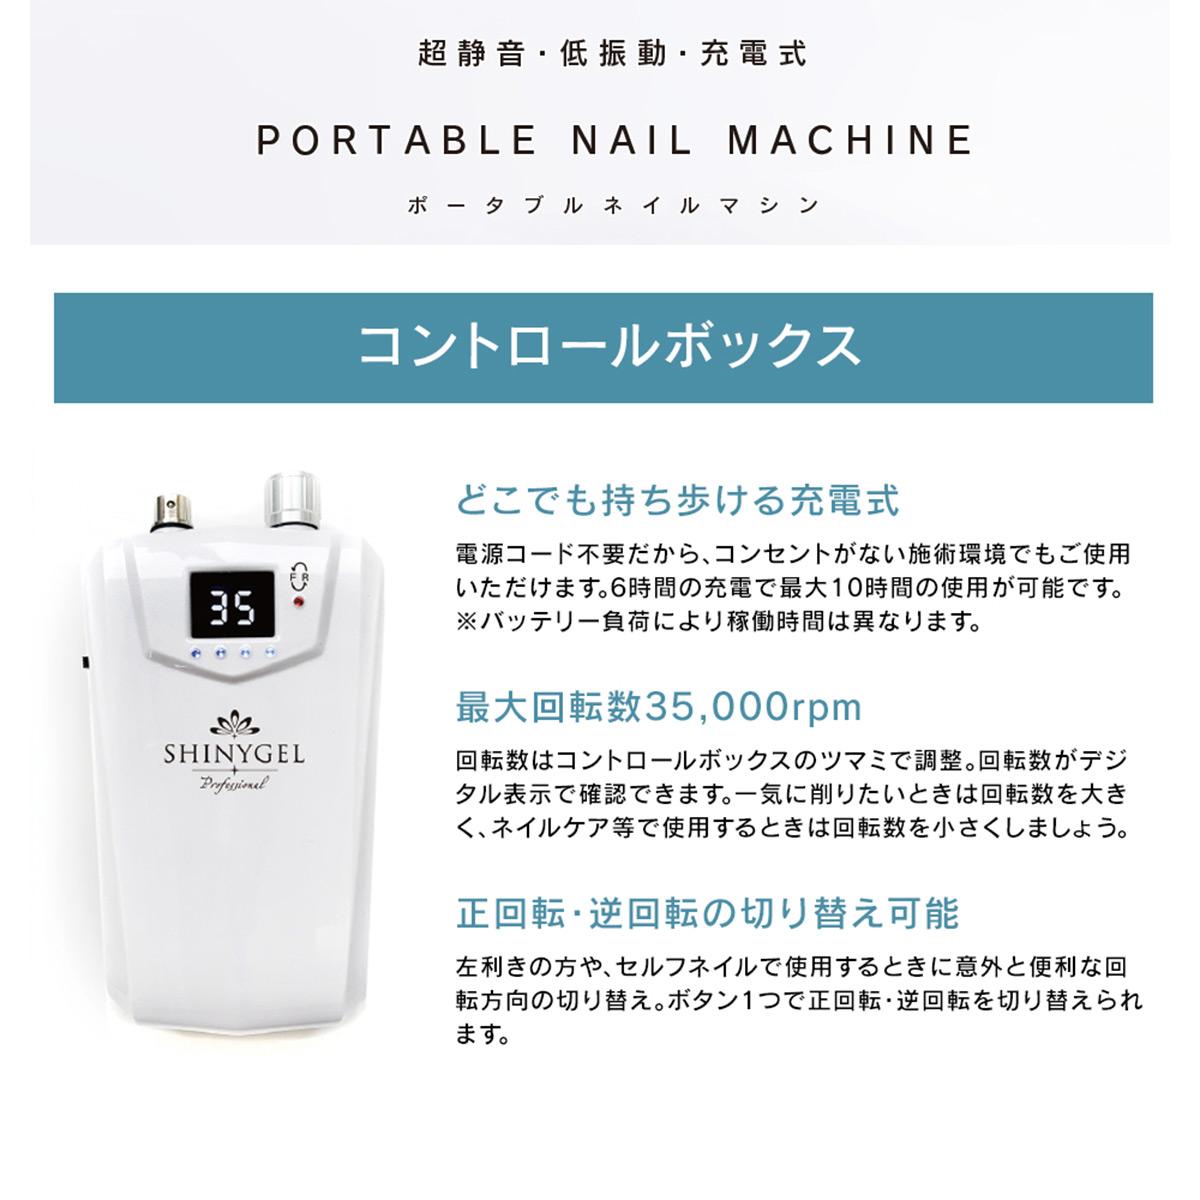 SHINYGEL Professional:ポータブルネイルマシン  (シャイニージェル・プロフェッショナル) $